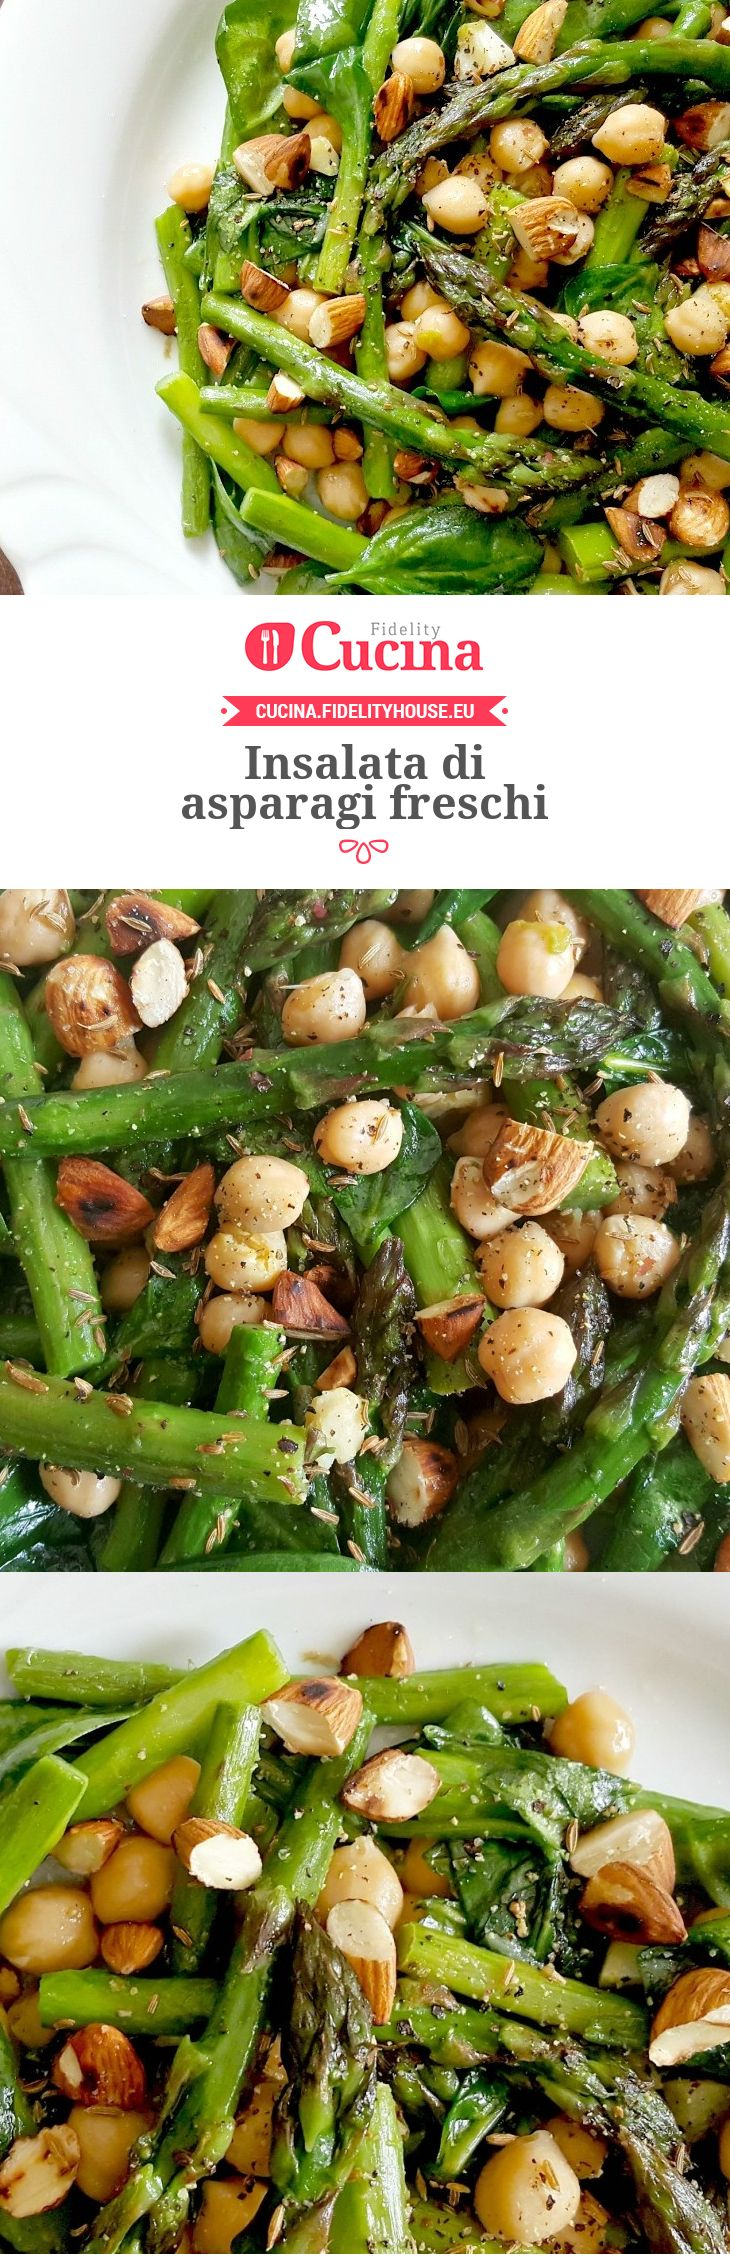 Insalata di asparagi freschi